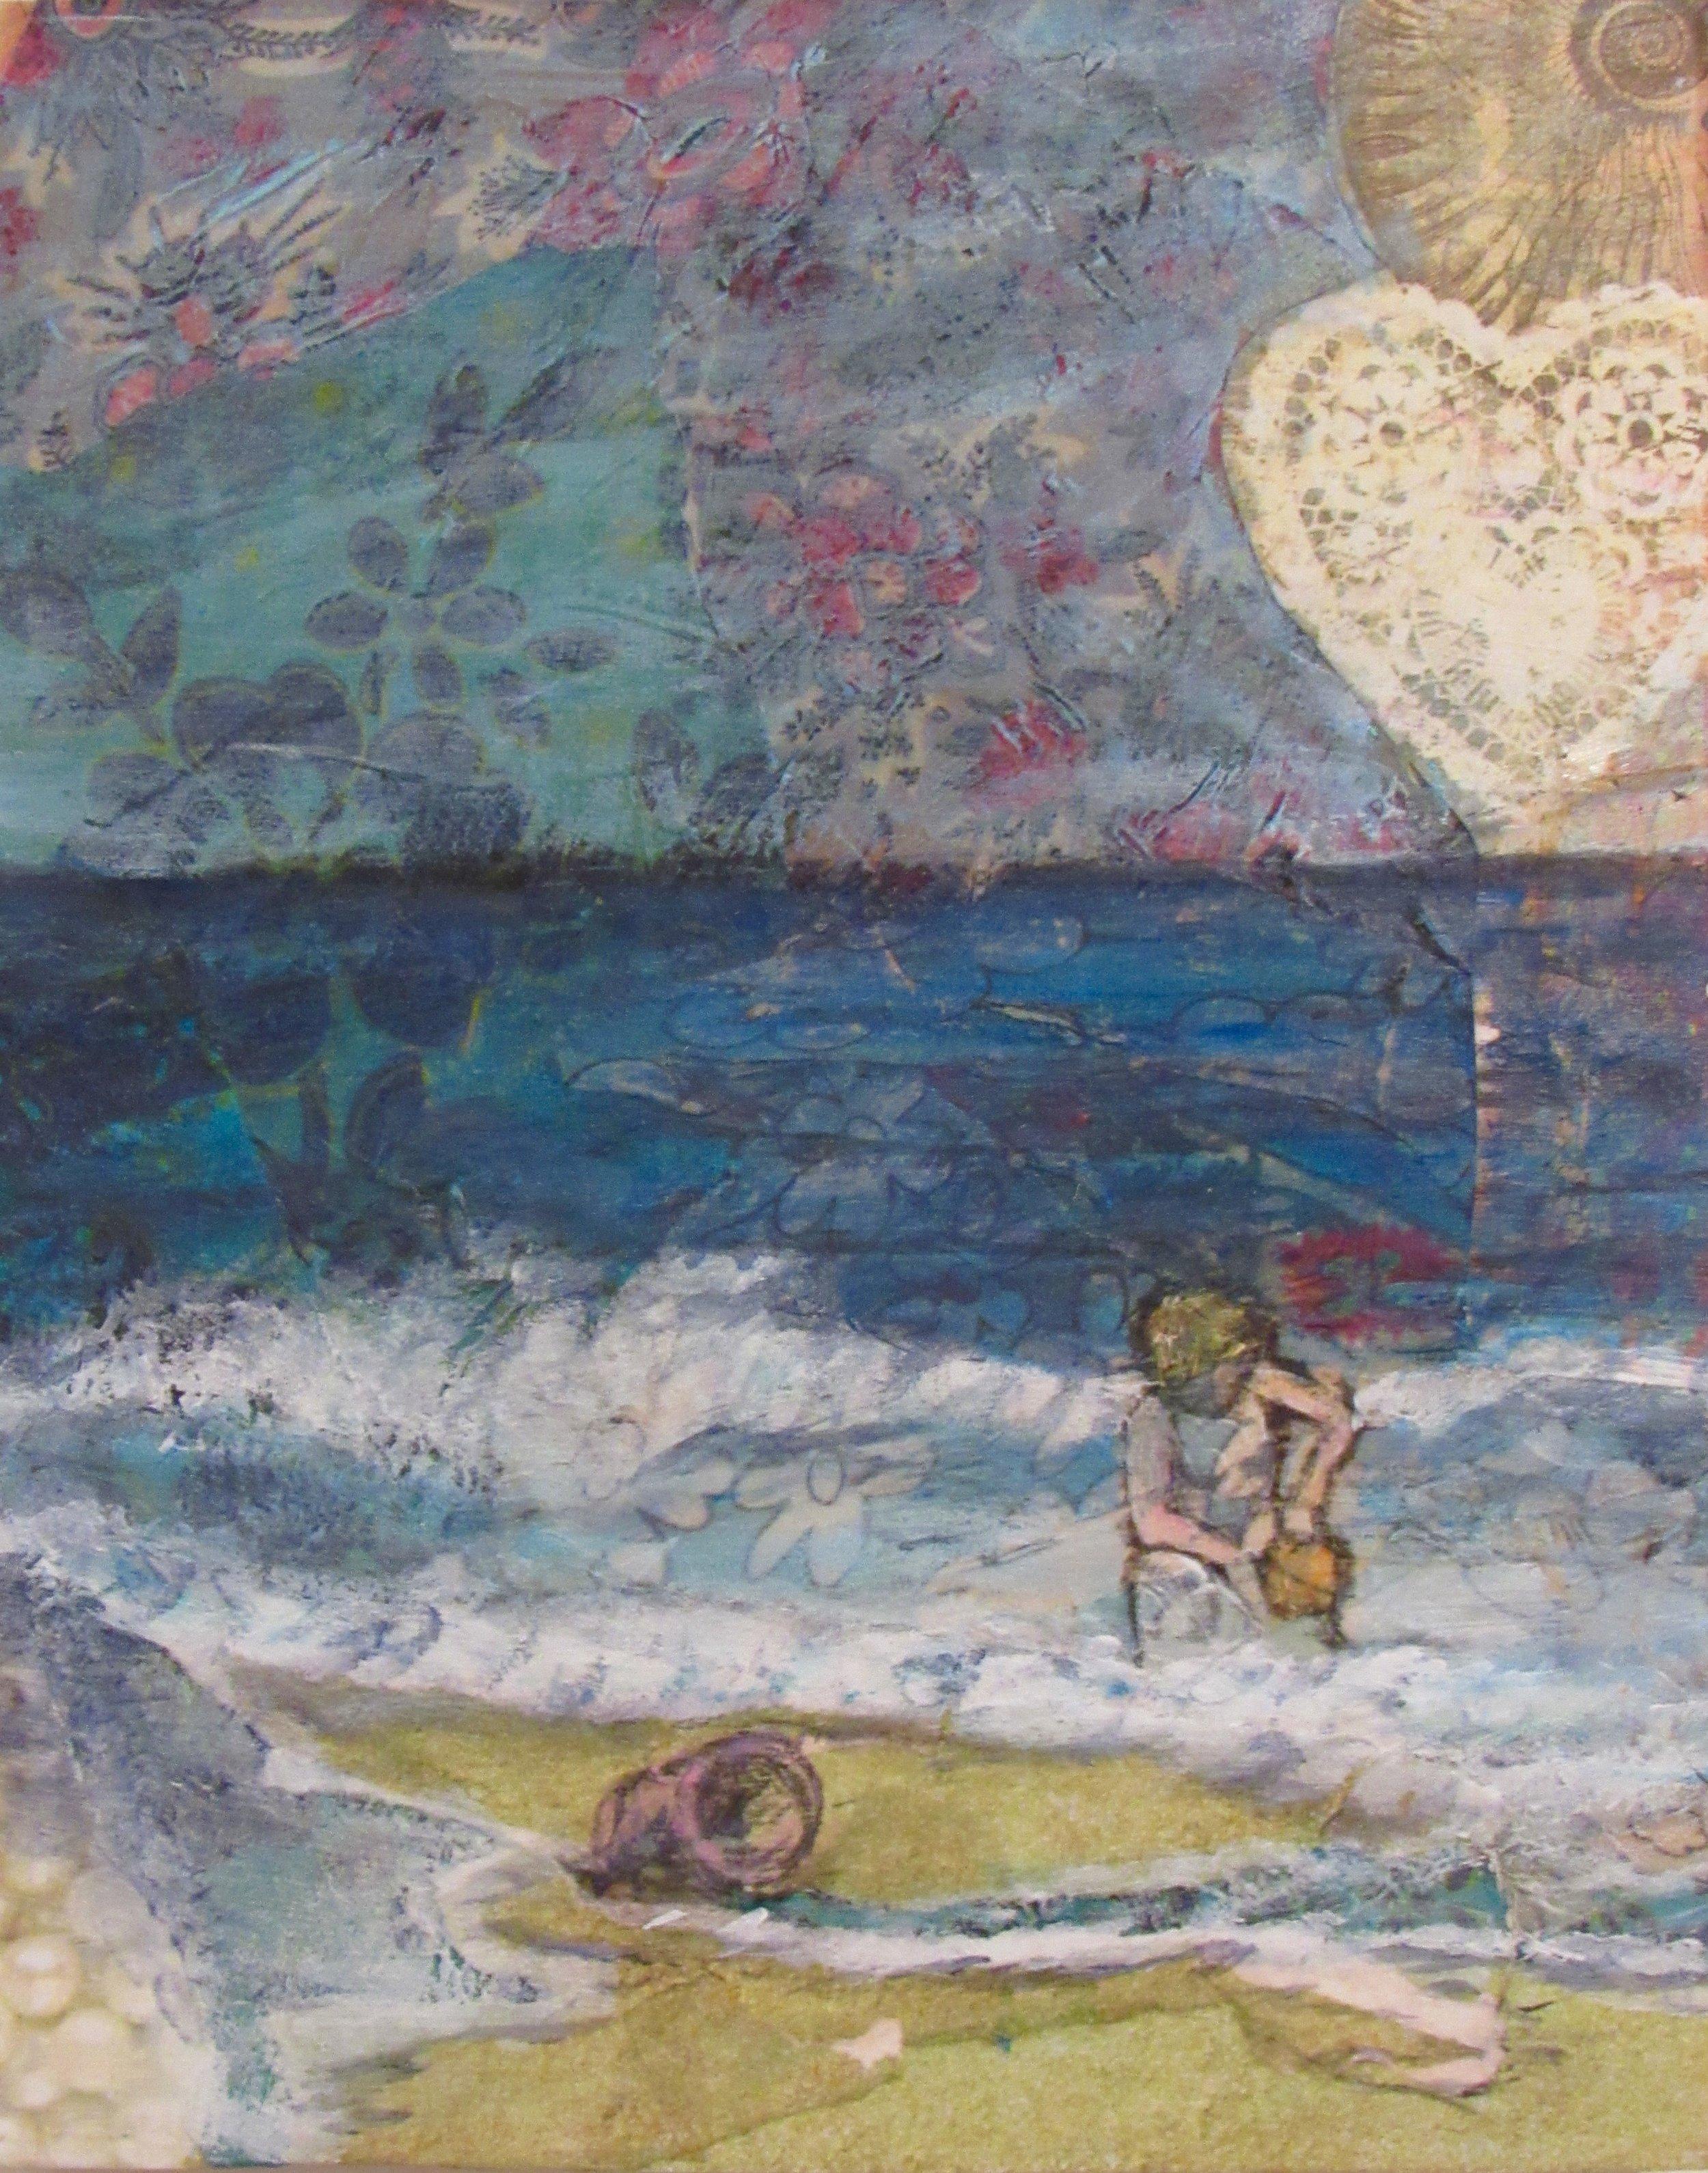 A bucket full of the ocean's love